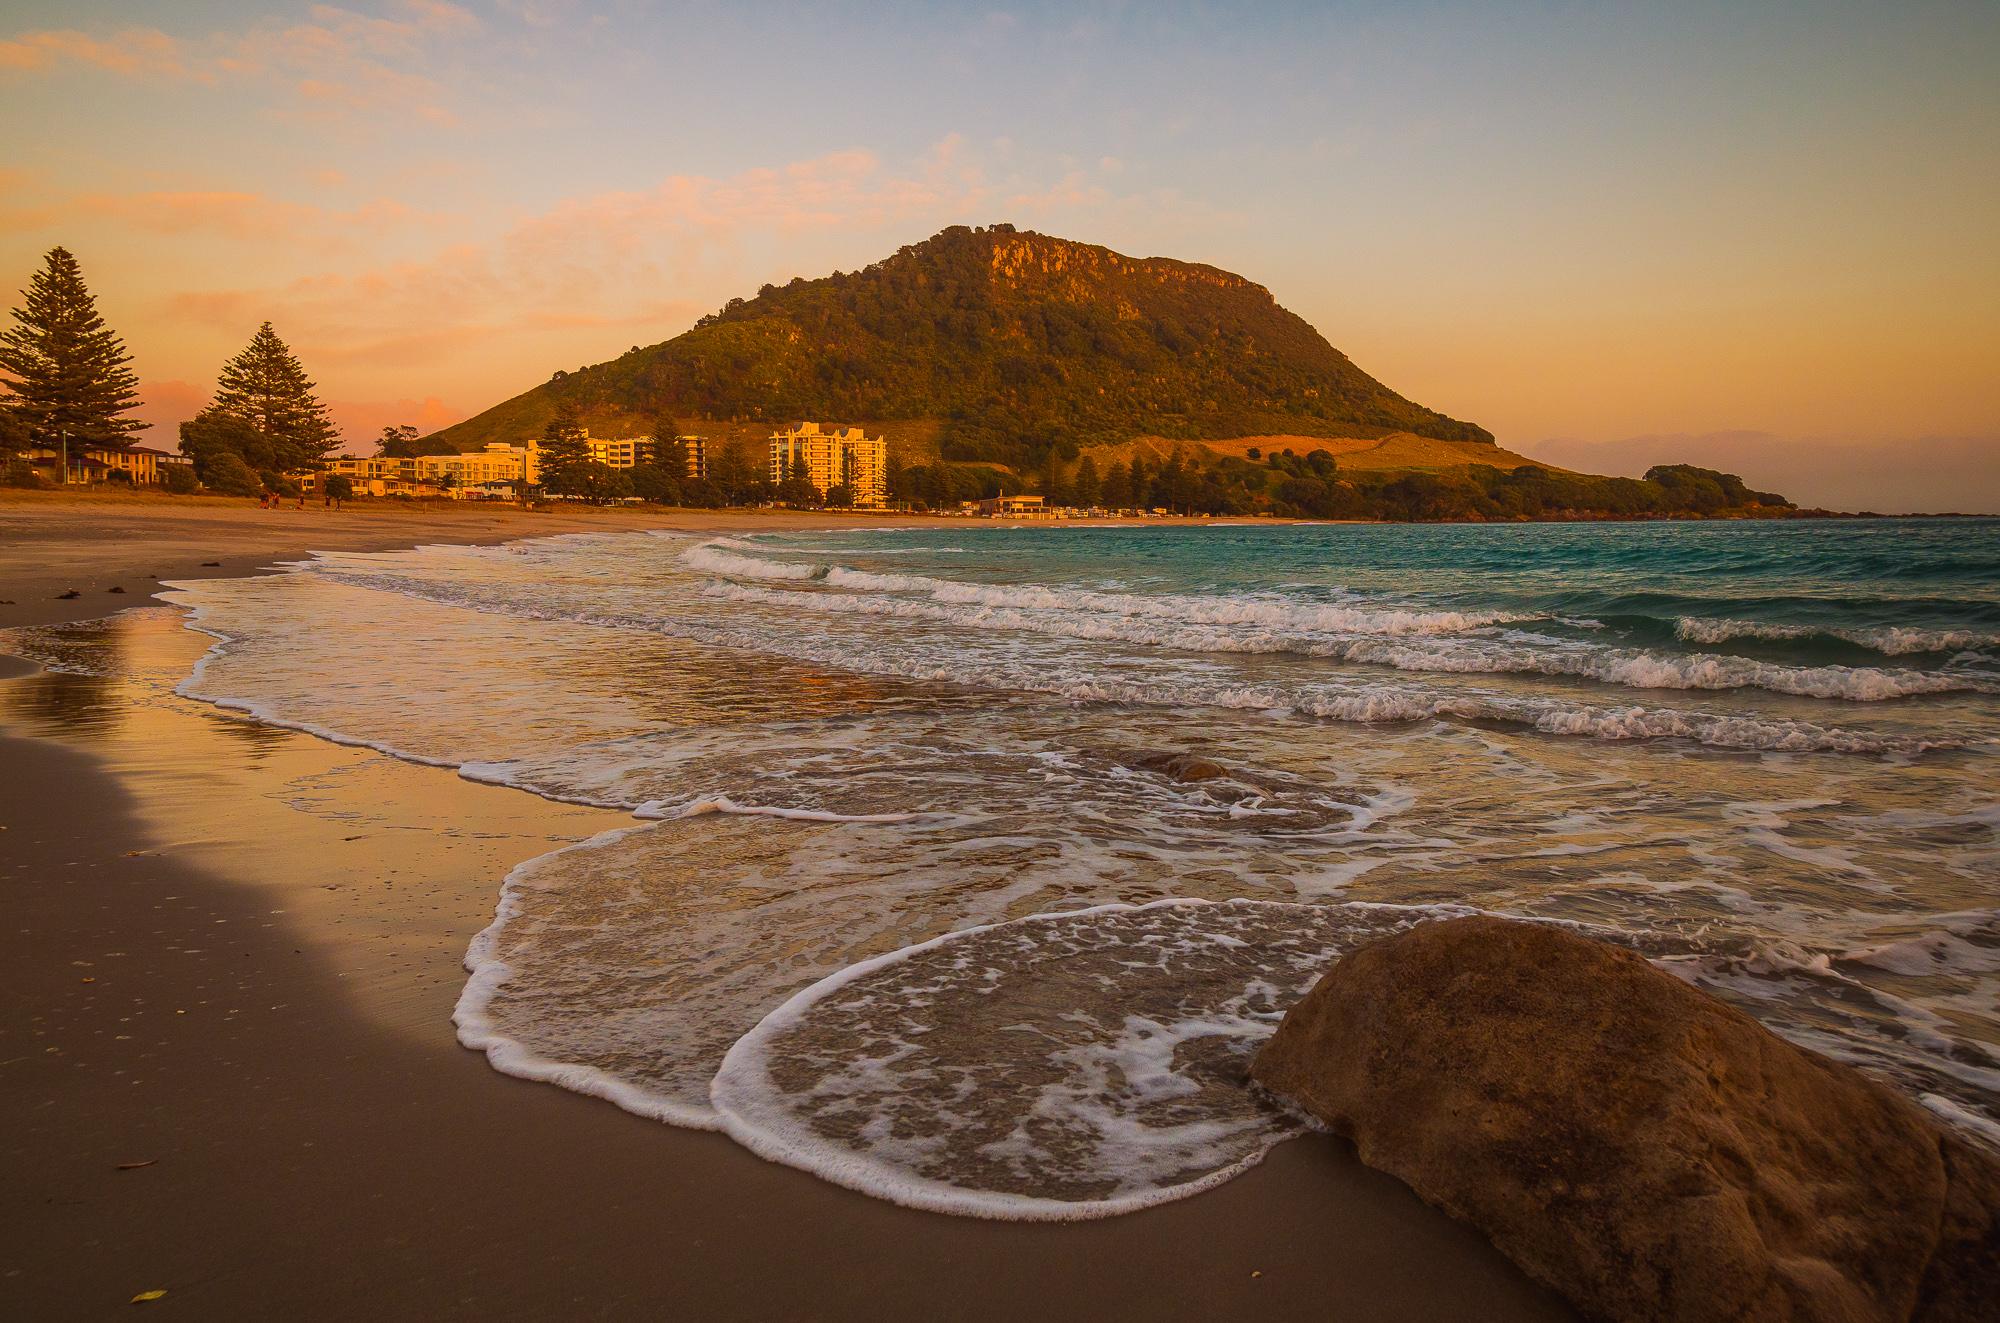 Incoming tide at dawn. P8030013